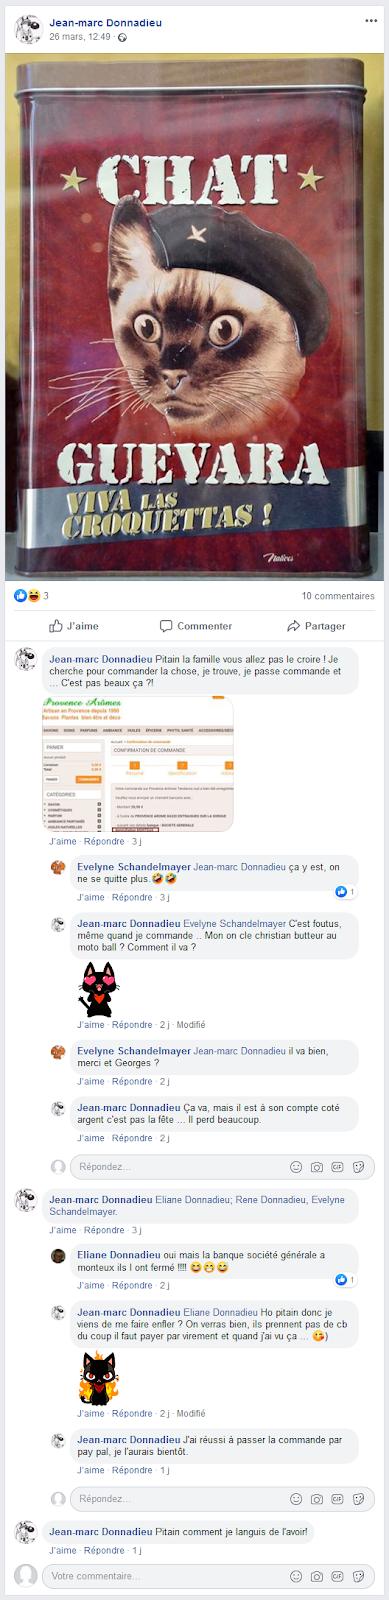 Effet Covid-19 : deux complices de Cherif Chekatt libérés depuis le 19 mars 2020 dans Attentats Jean-marc%2BDonnadieu%2BChecat%2B1%2B-%2Bwww.facebook.com